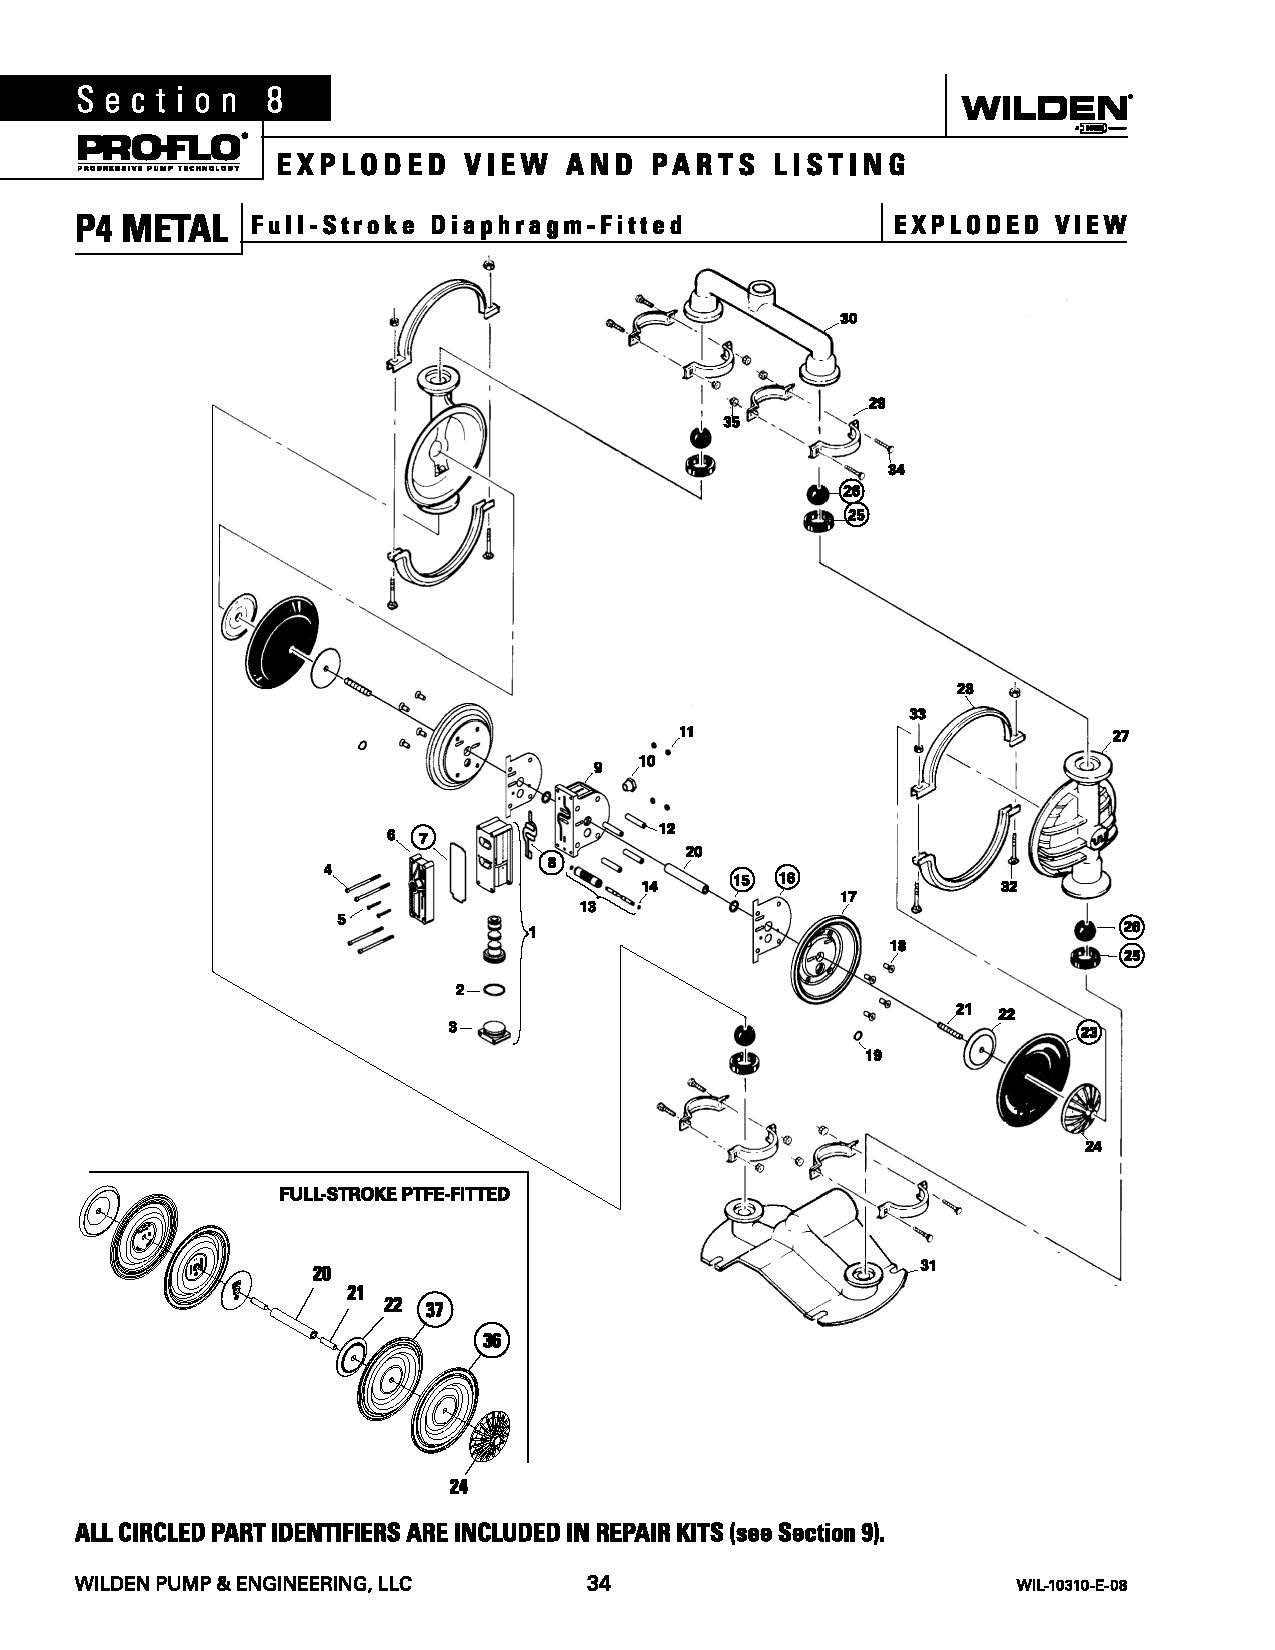 Wilden P4 Original Metal Full Stroke Pumping Solutions Inc